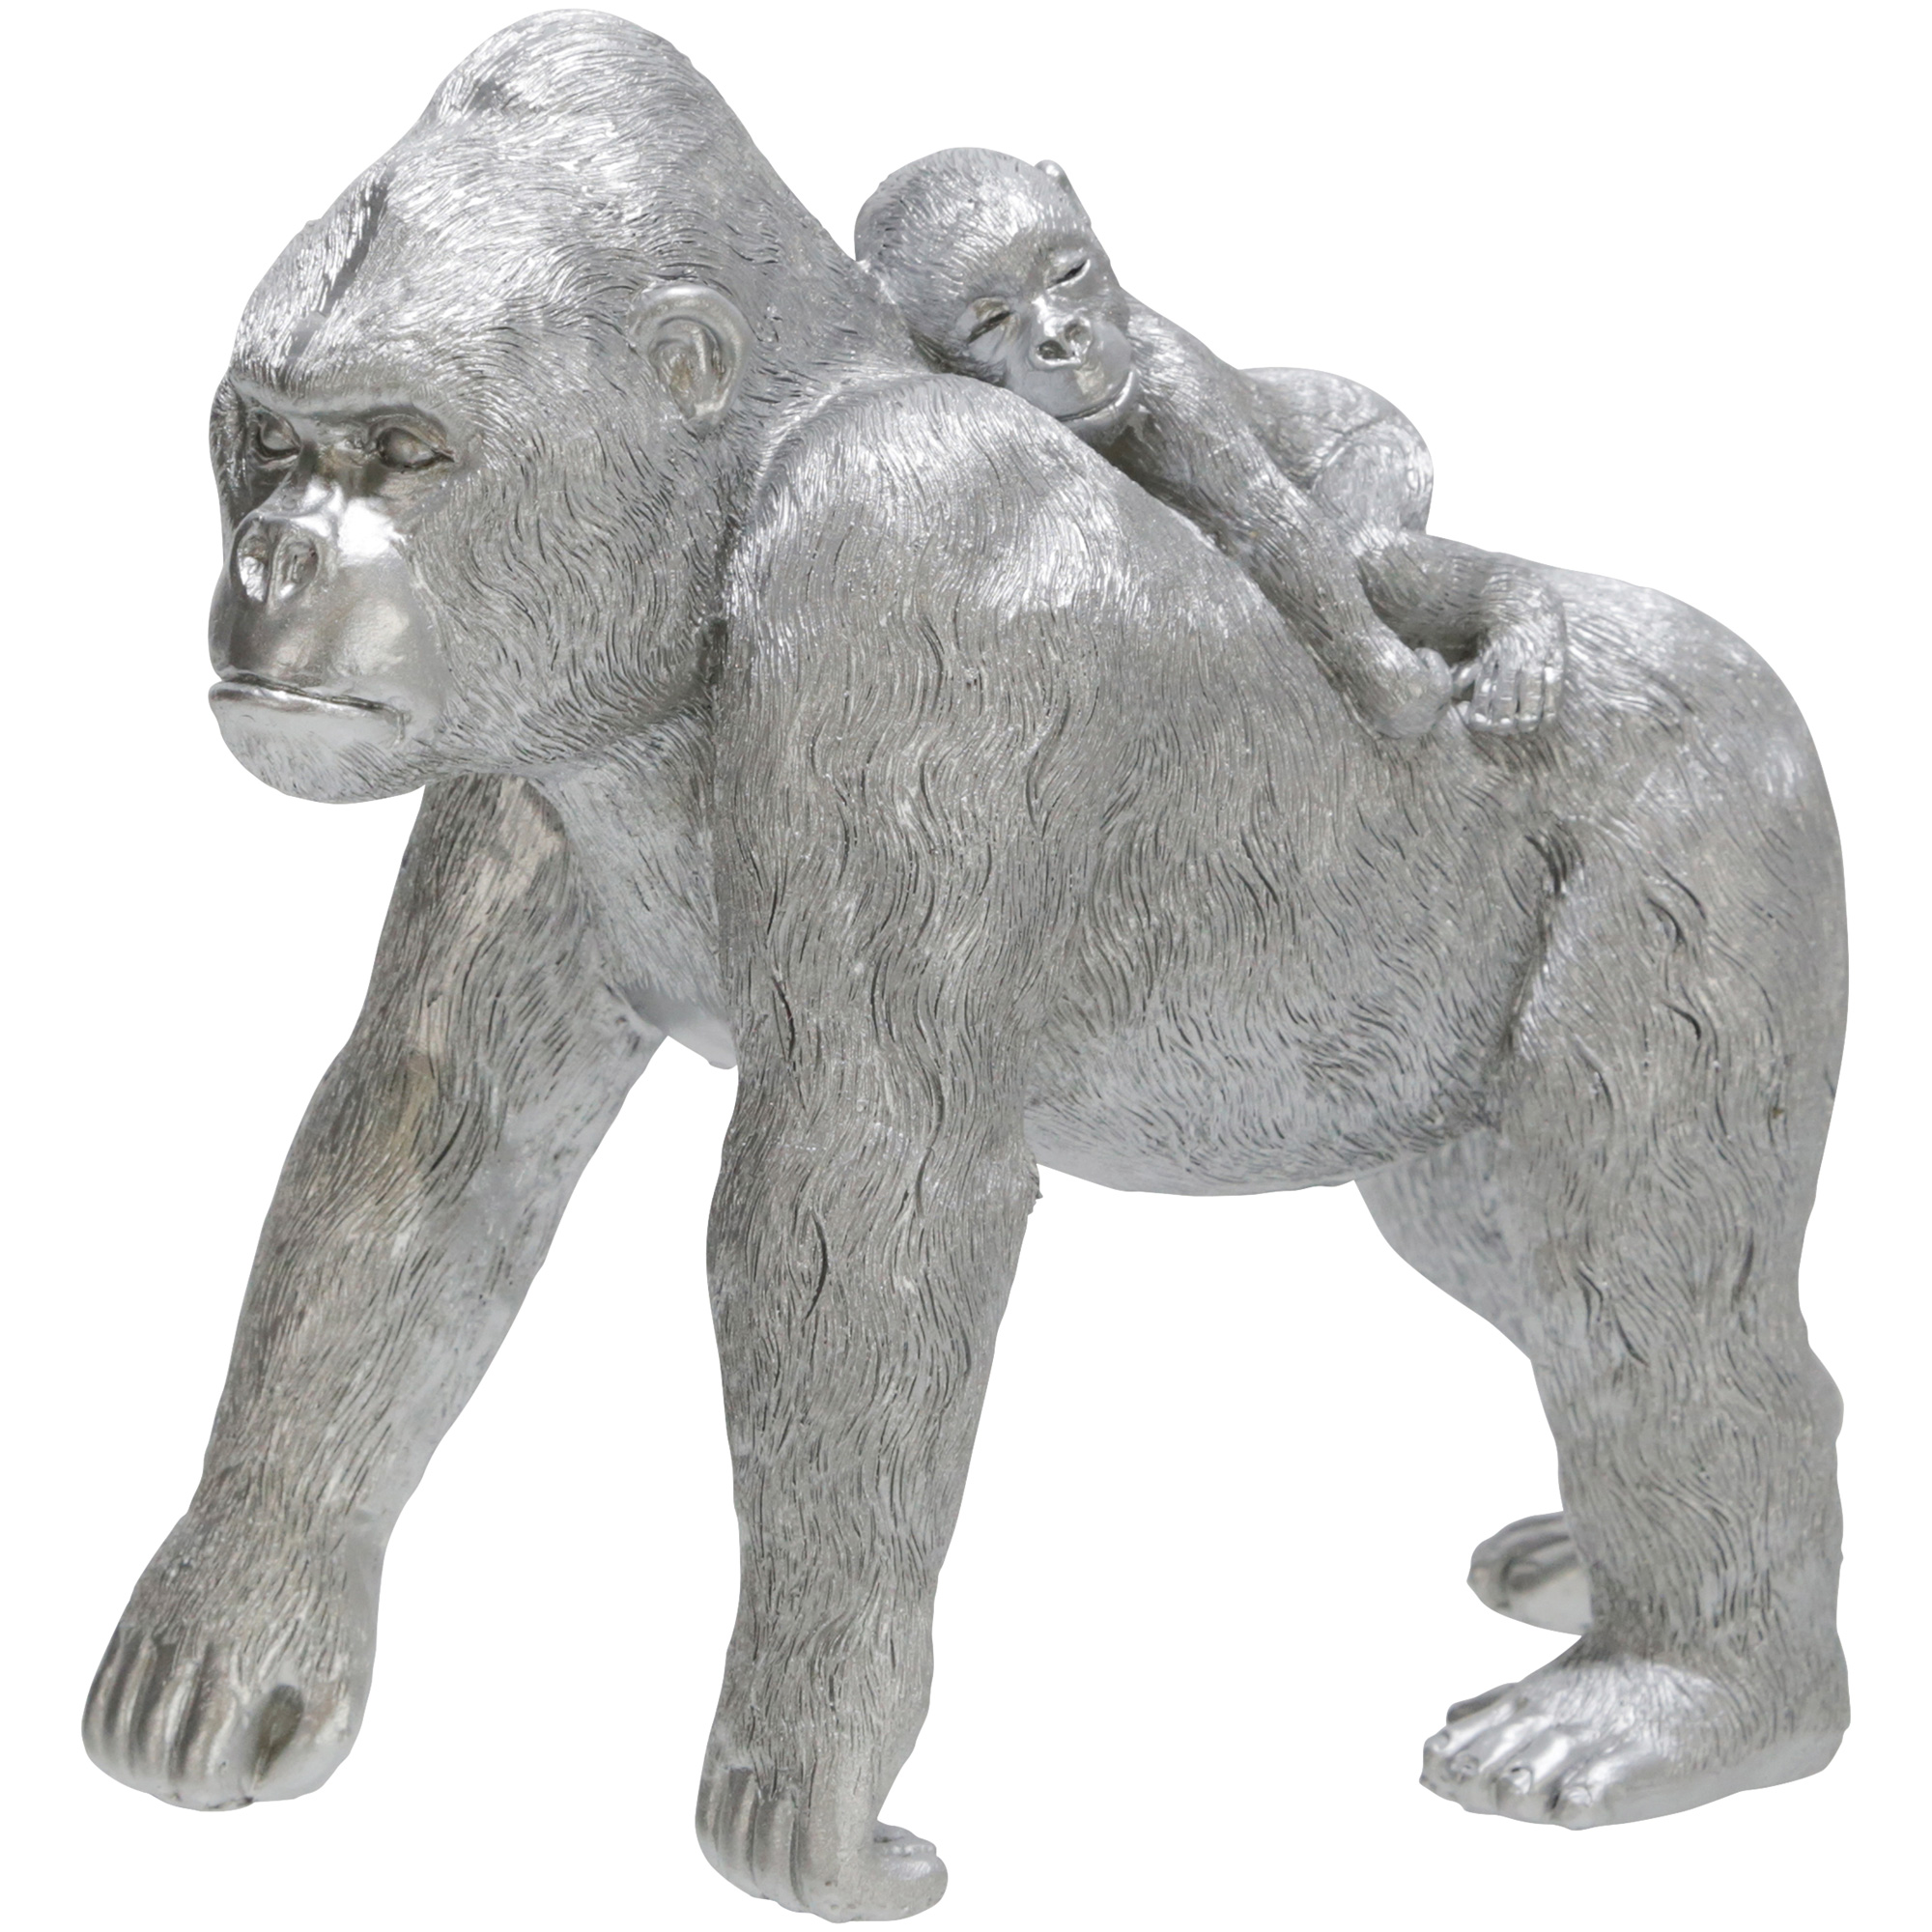 Sagebrook | Elevated Chic Mama and Baby Gorilla